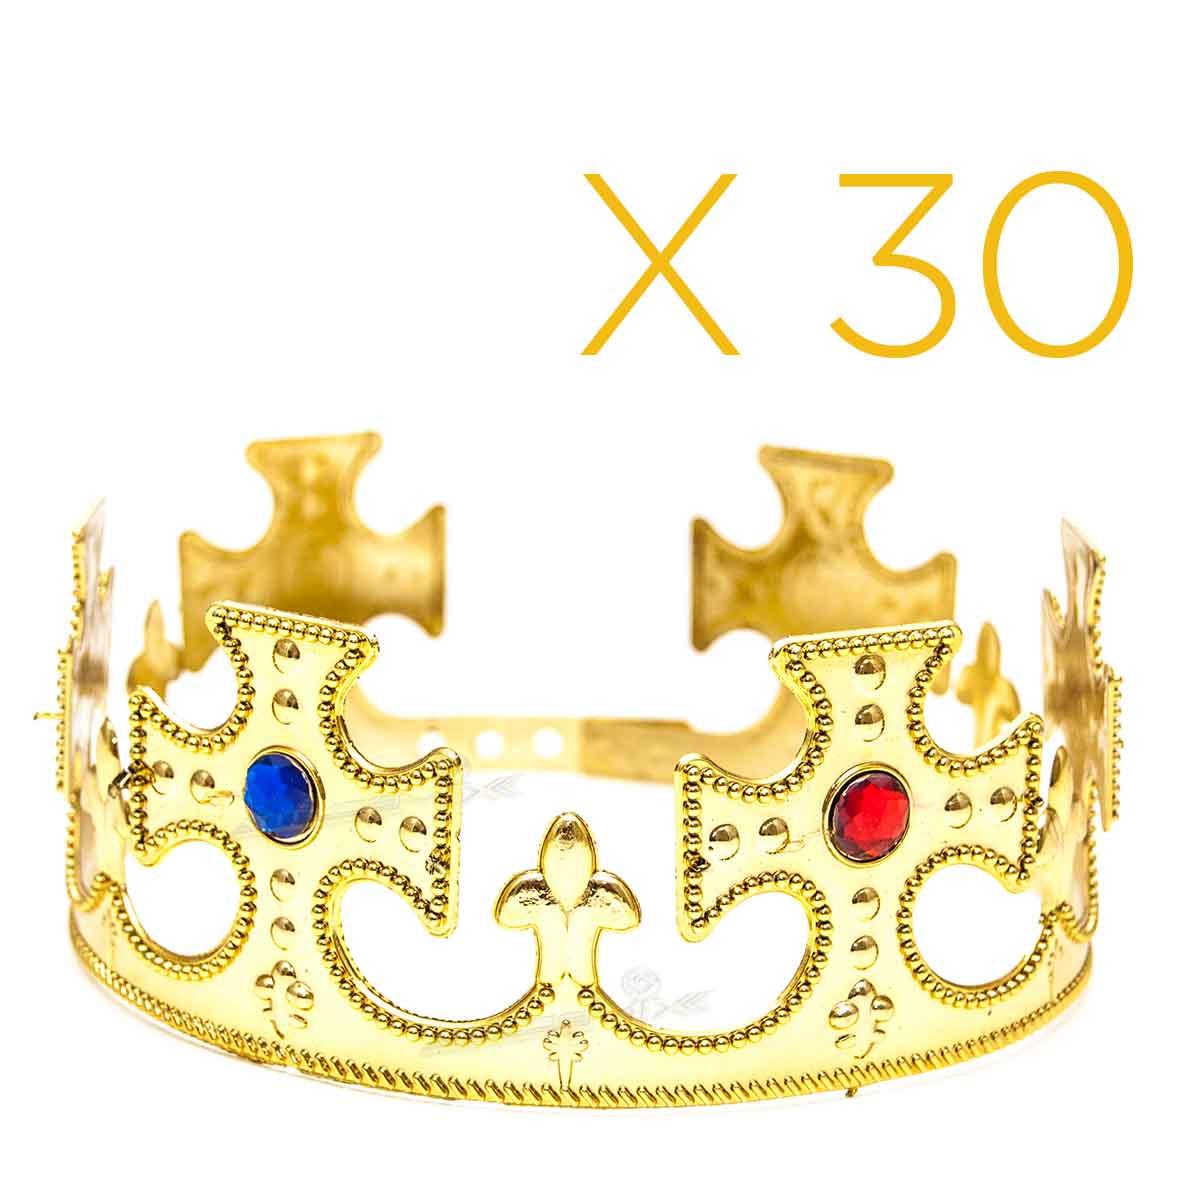 Kit 30 Coroas Rei Plástica Ajustável Festa Fantasia Cosplay